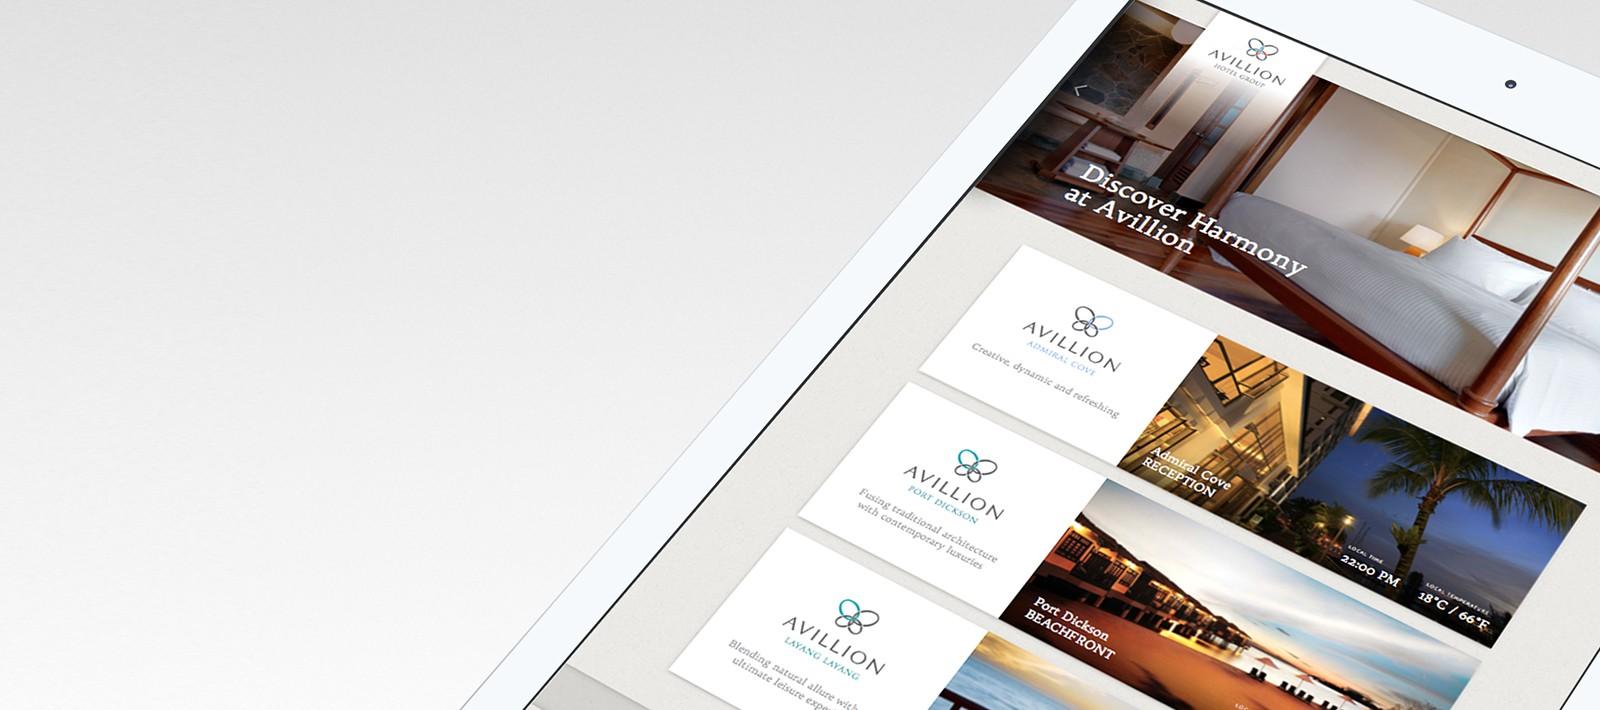 App development for a hospitality brand